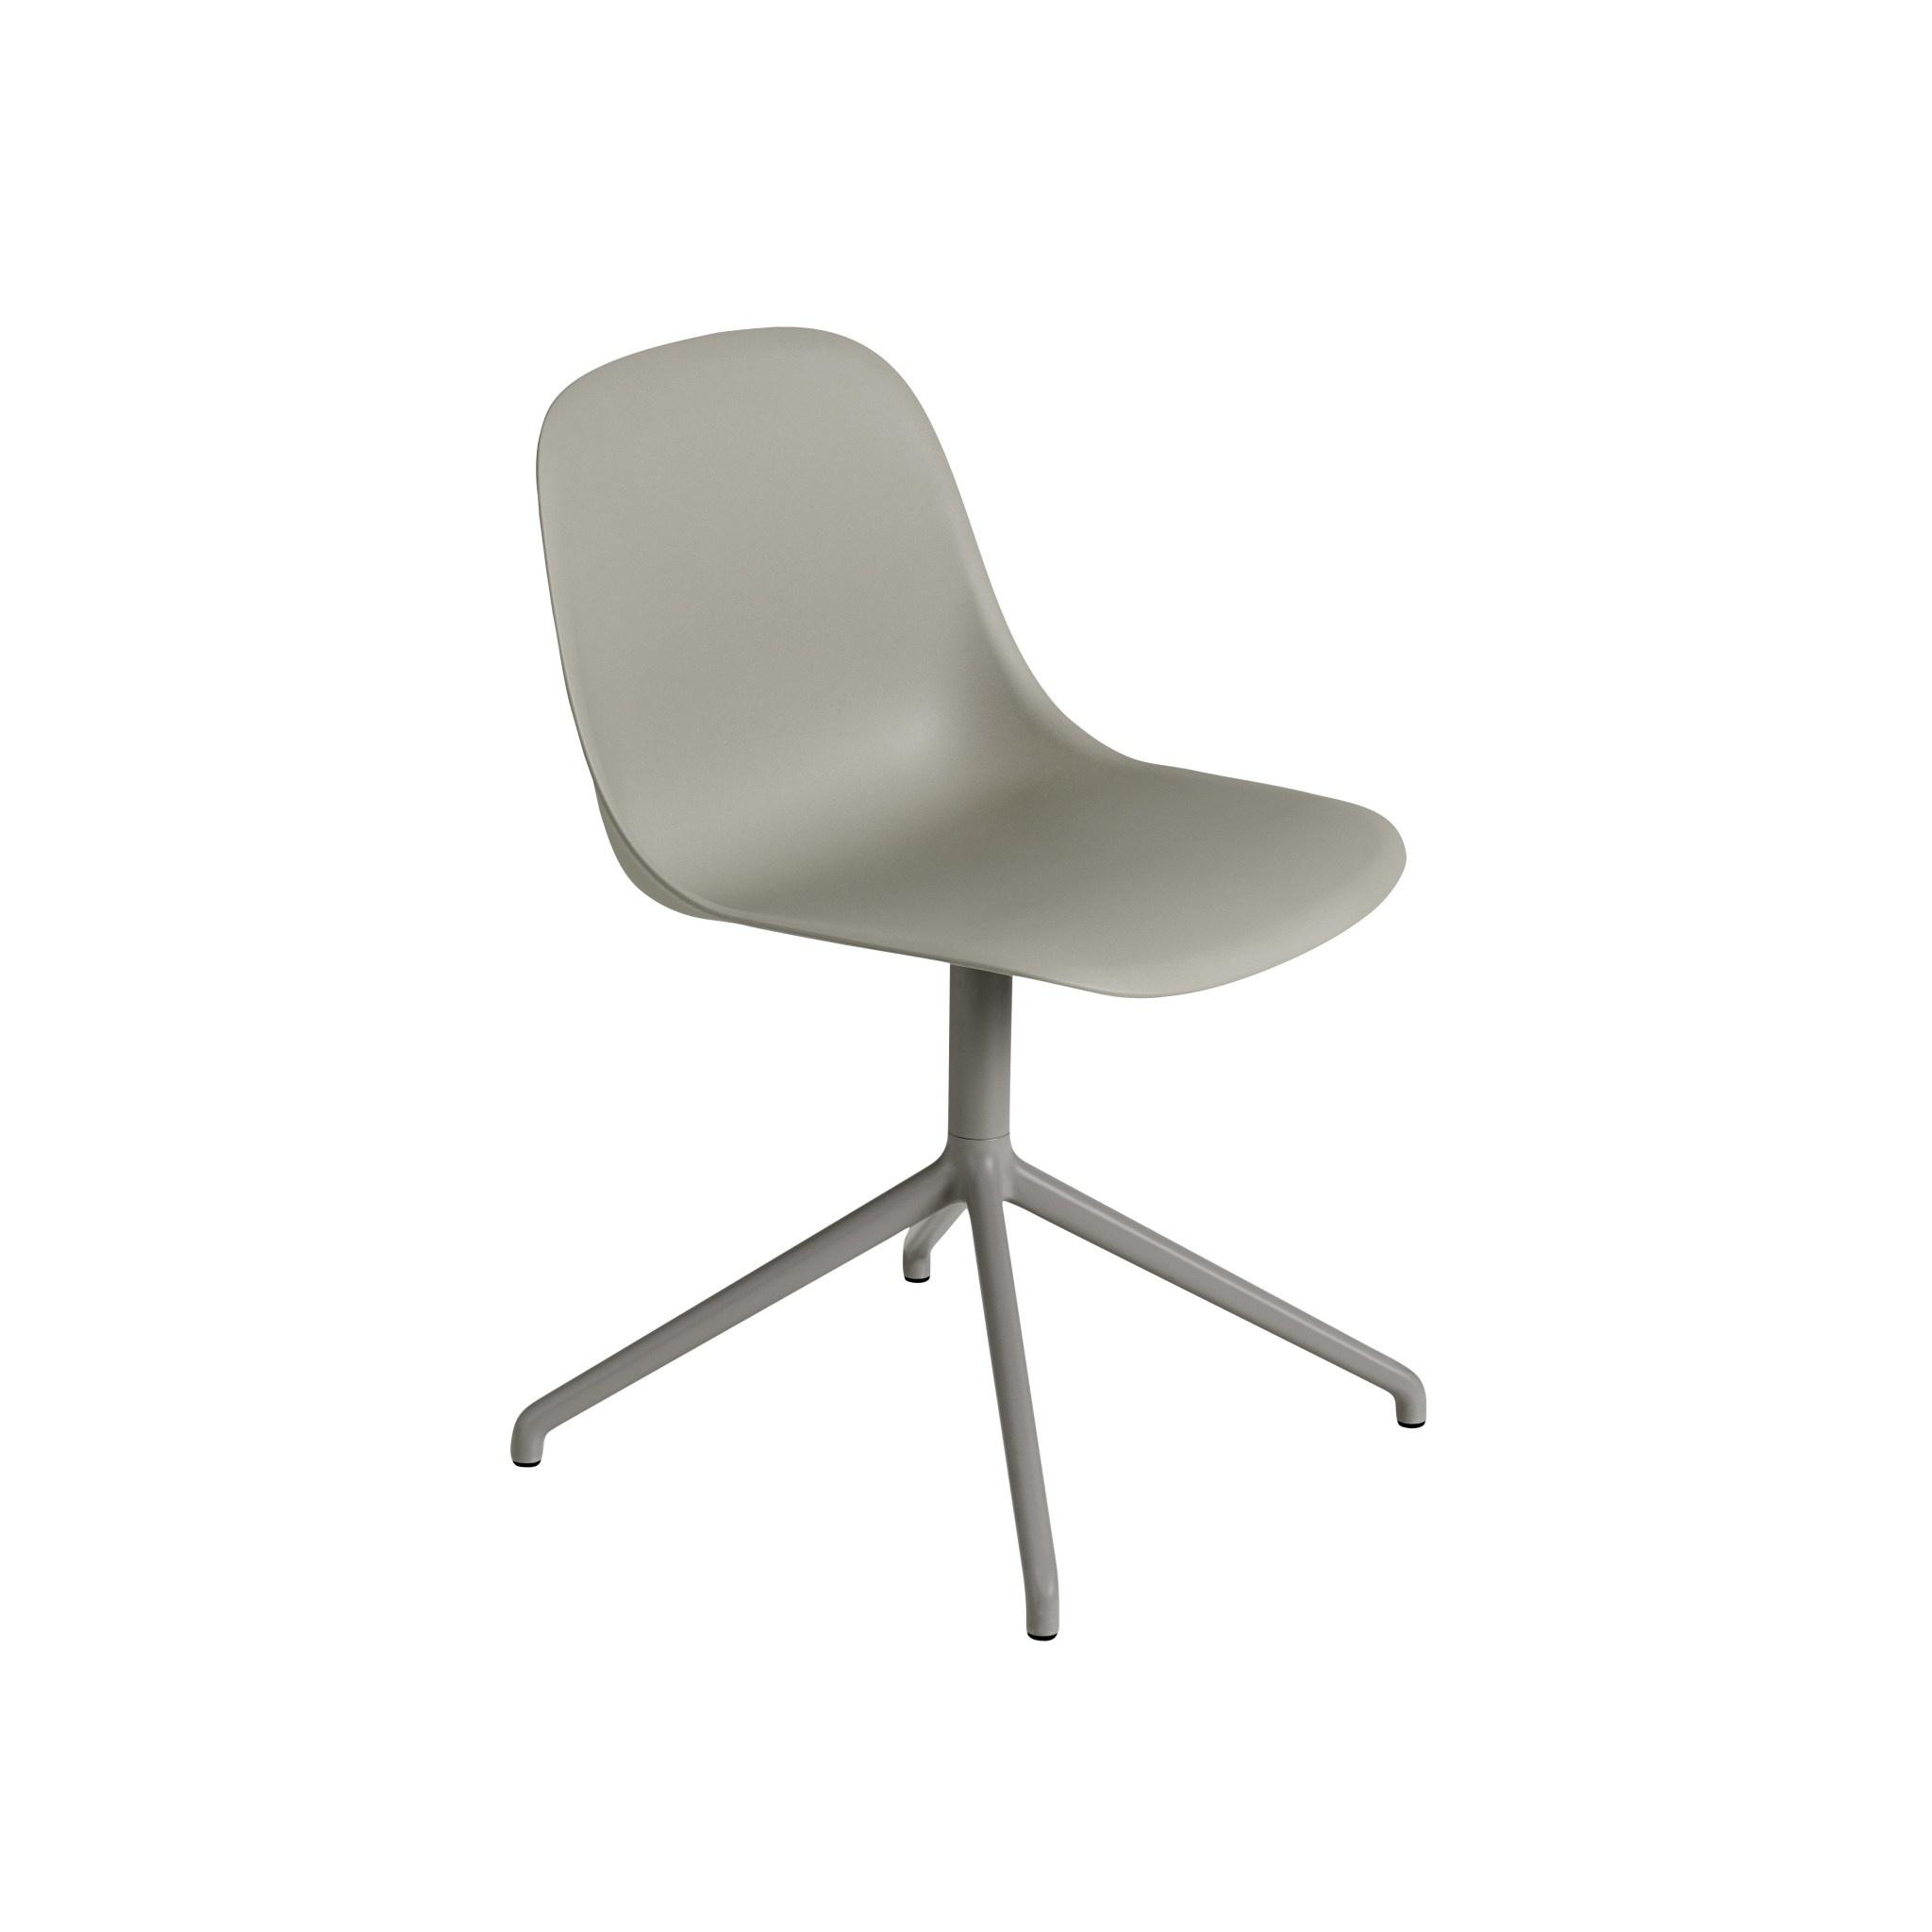 Fiber side chair swivel base w.o. return-4